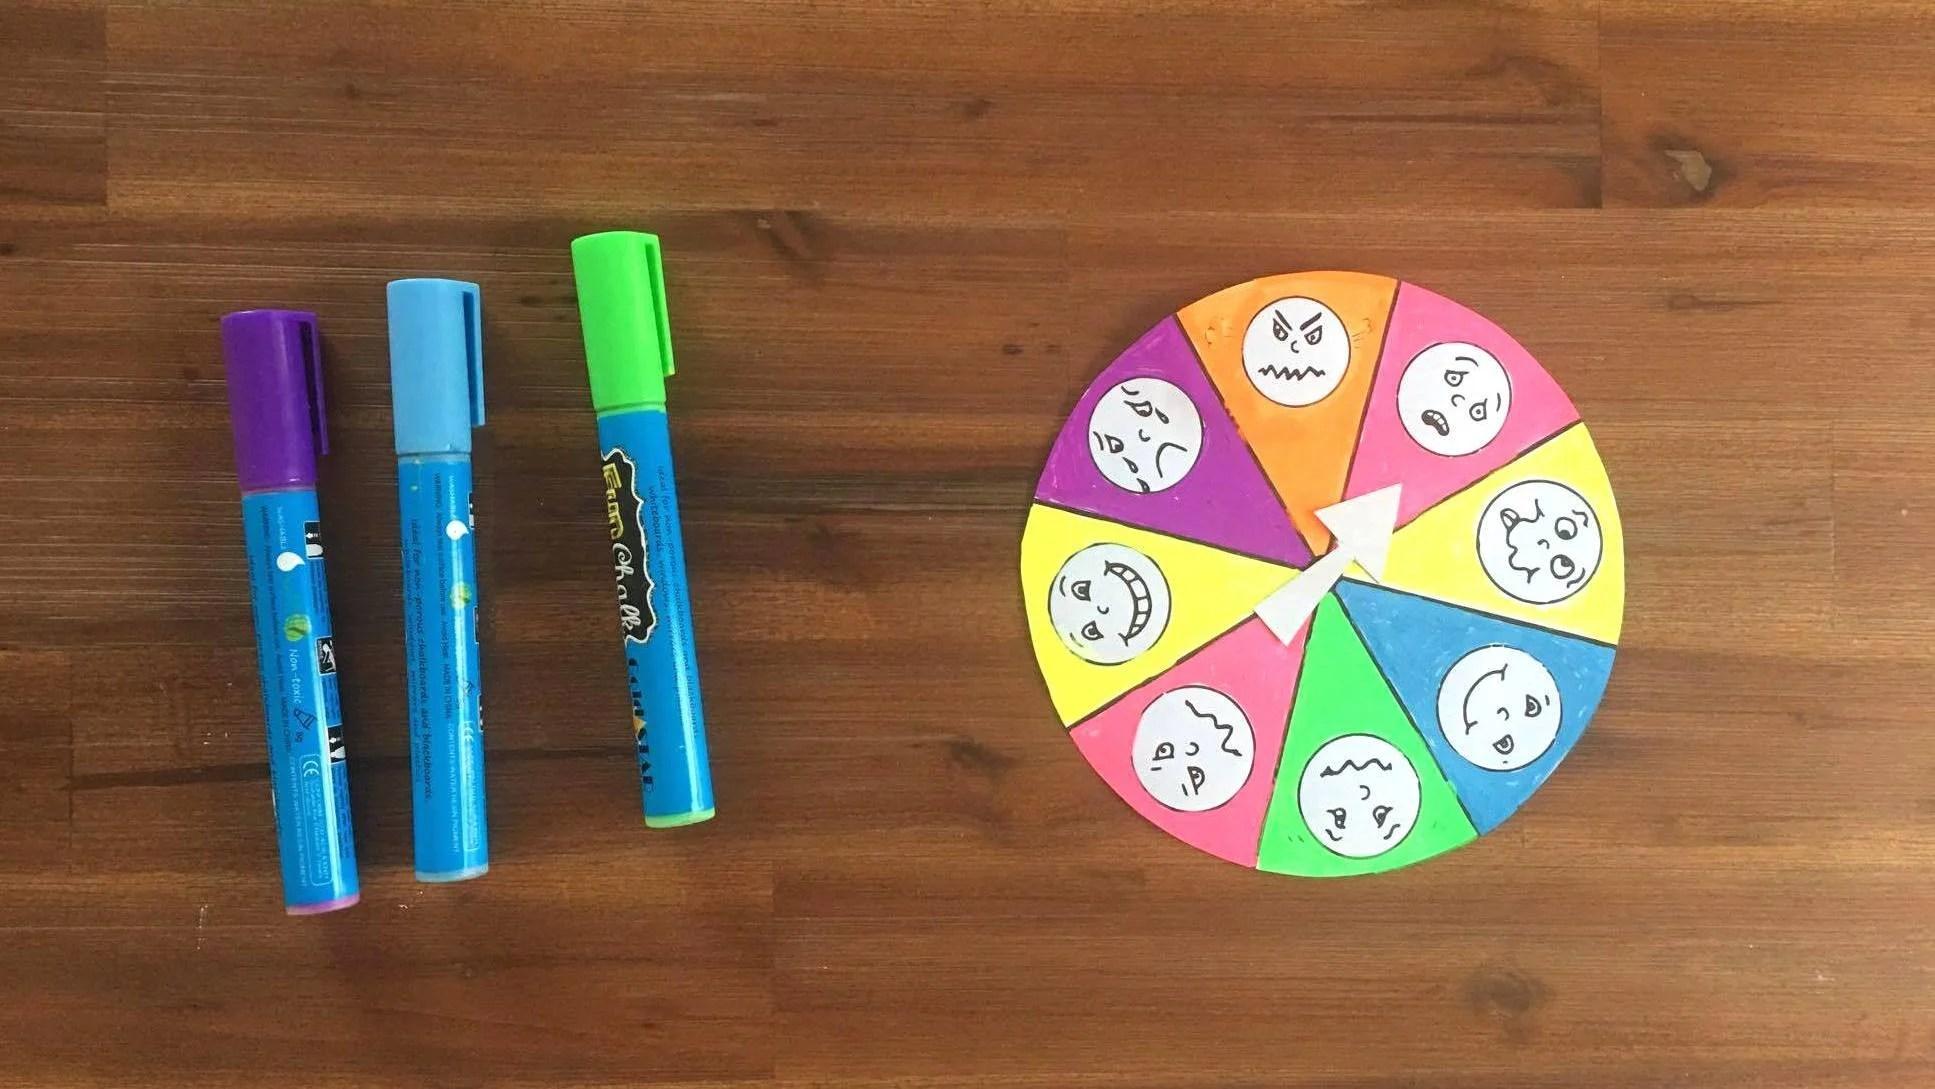 Make An Emotion Wheel To Help Kids Express Their Feelings